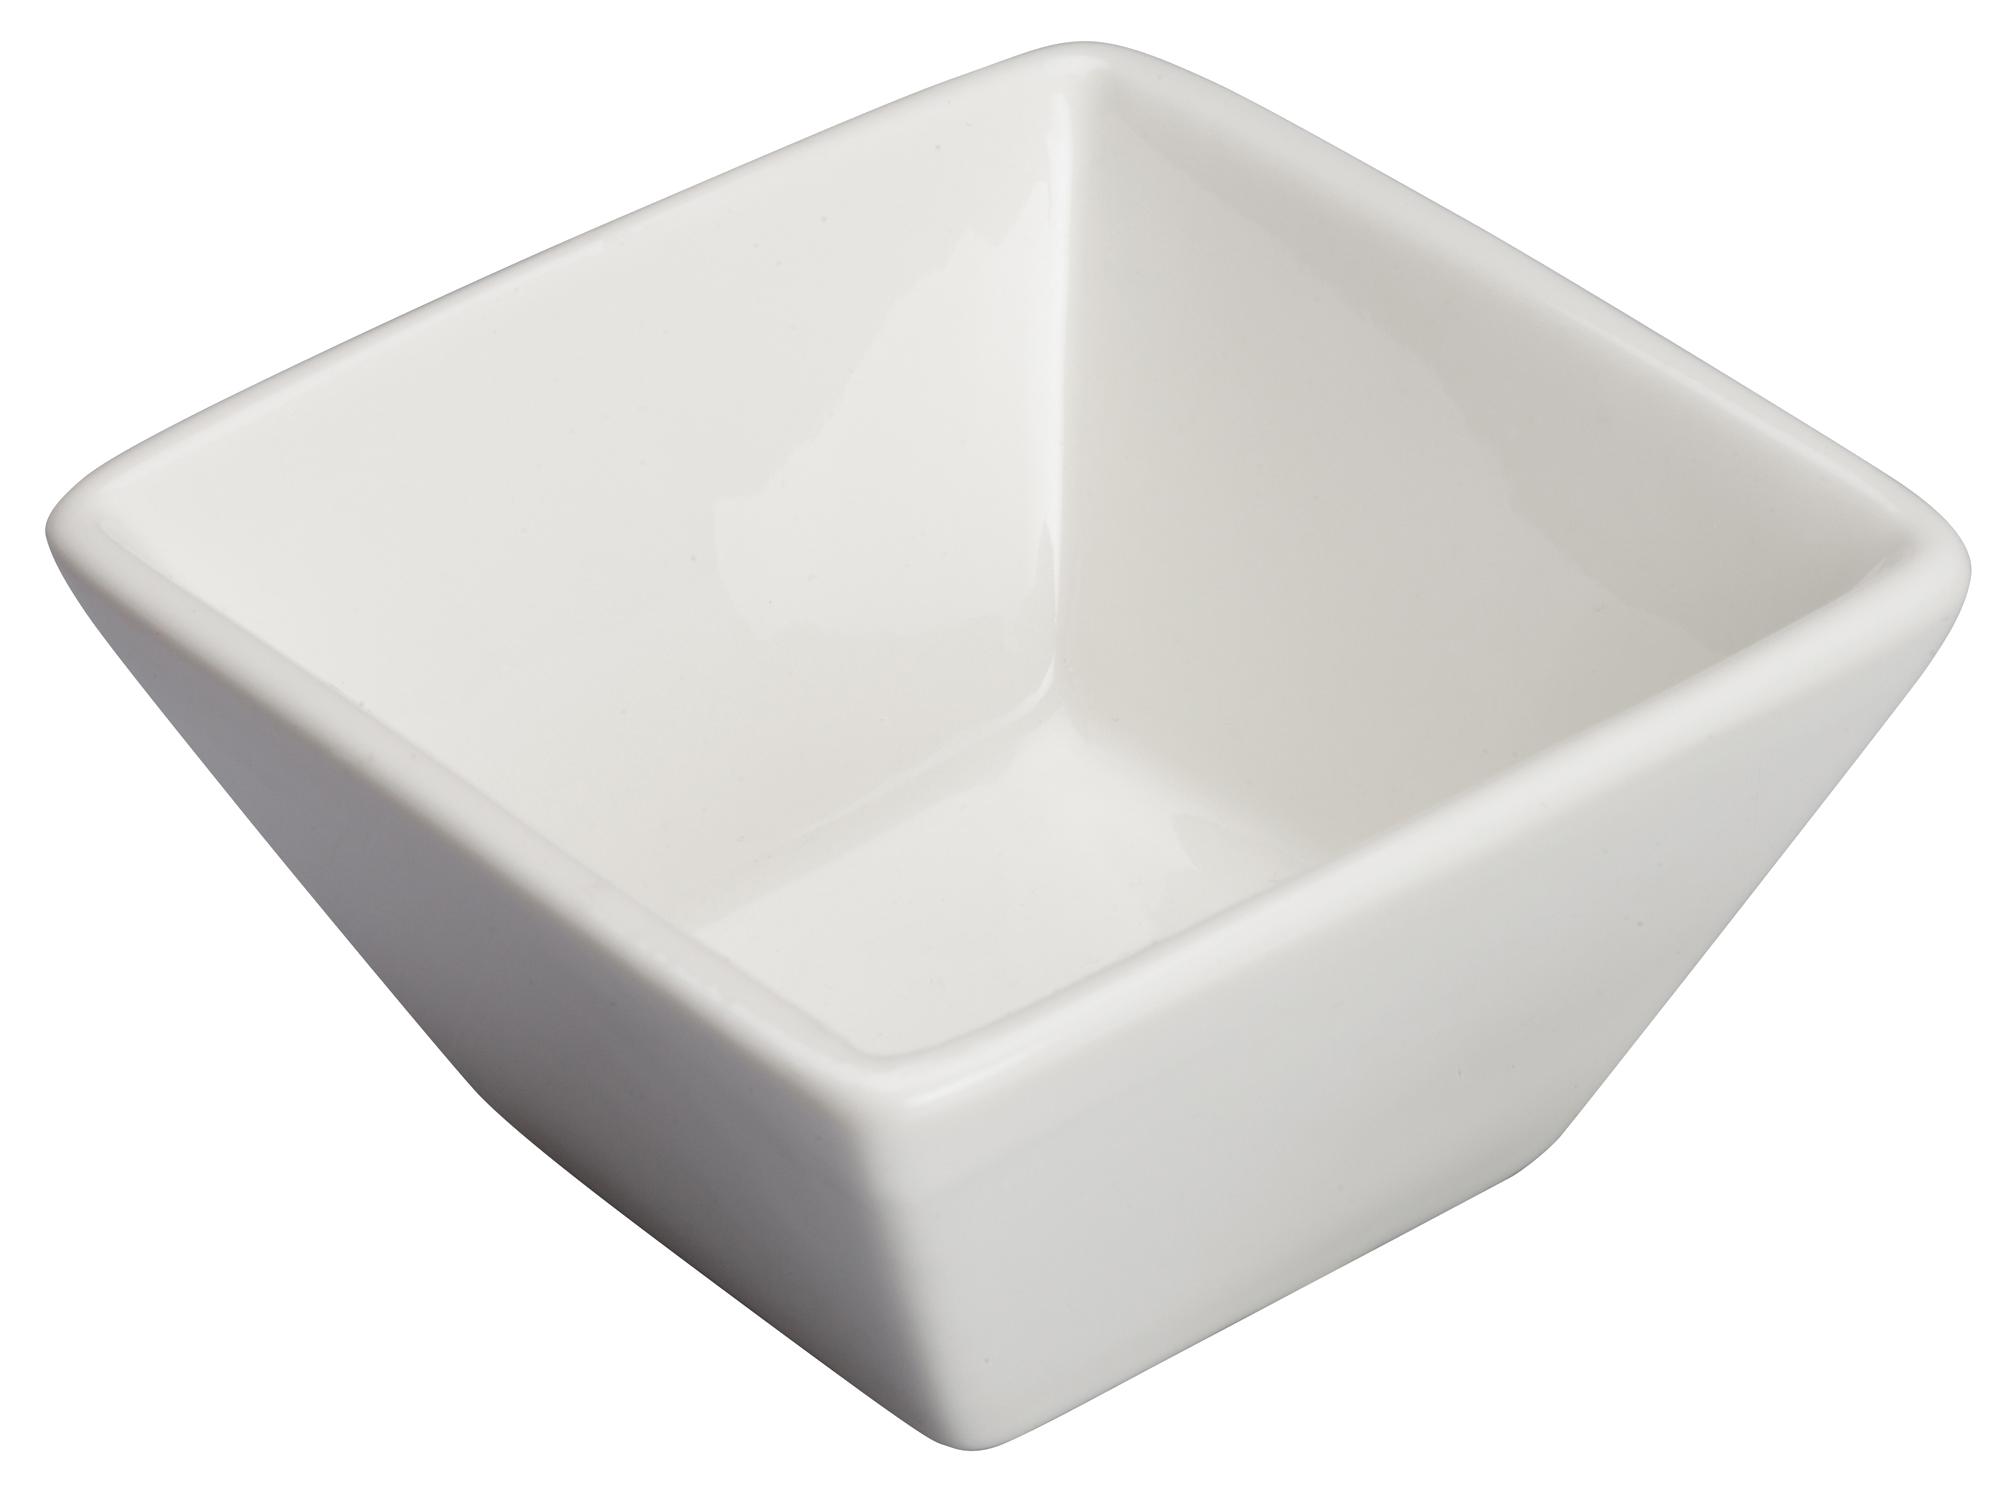 Winco WDP021-105 china, bowl,  0 - 8 oz